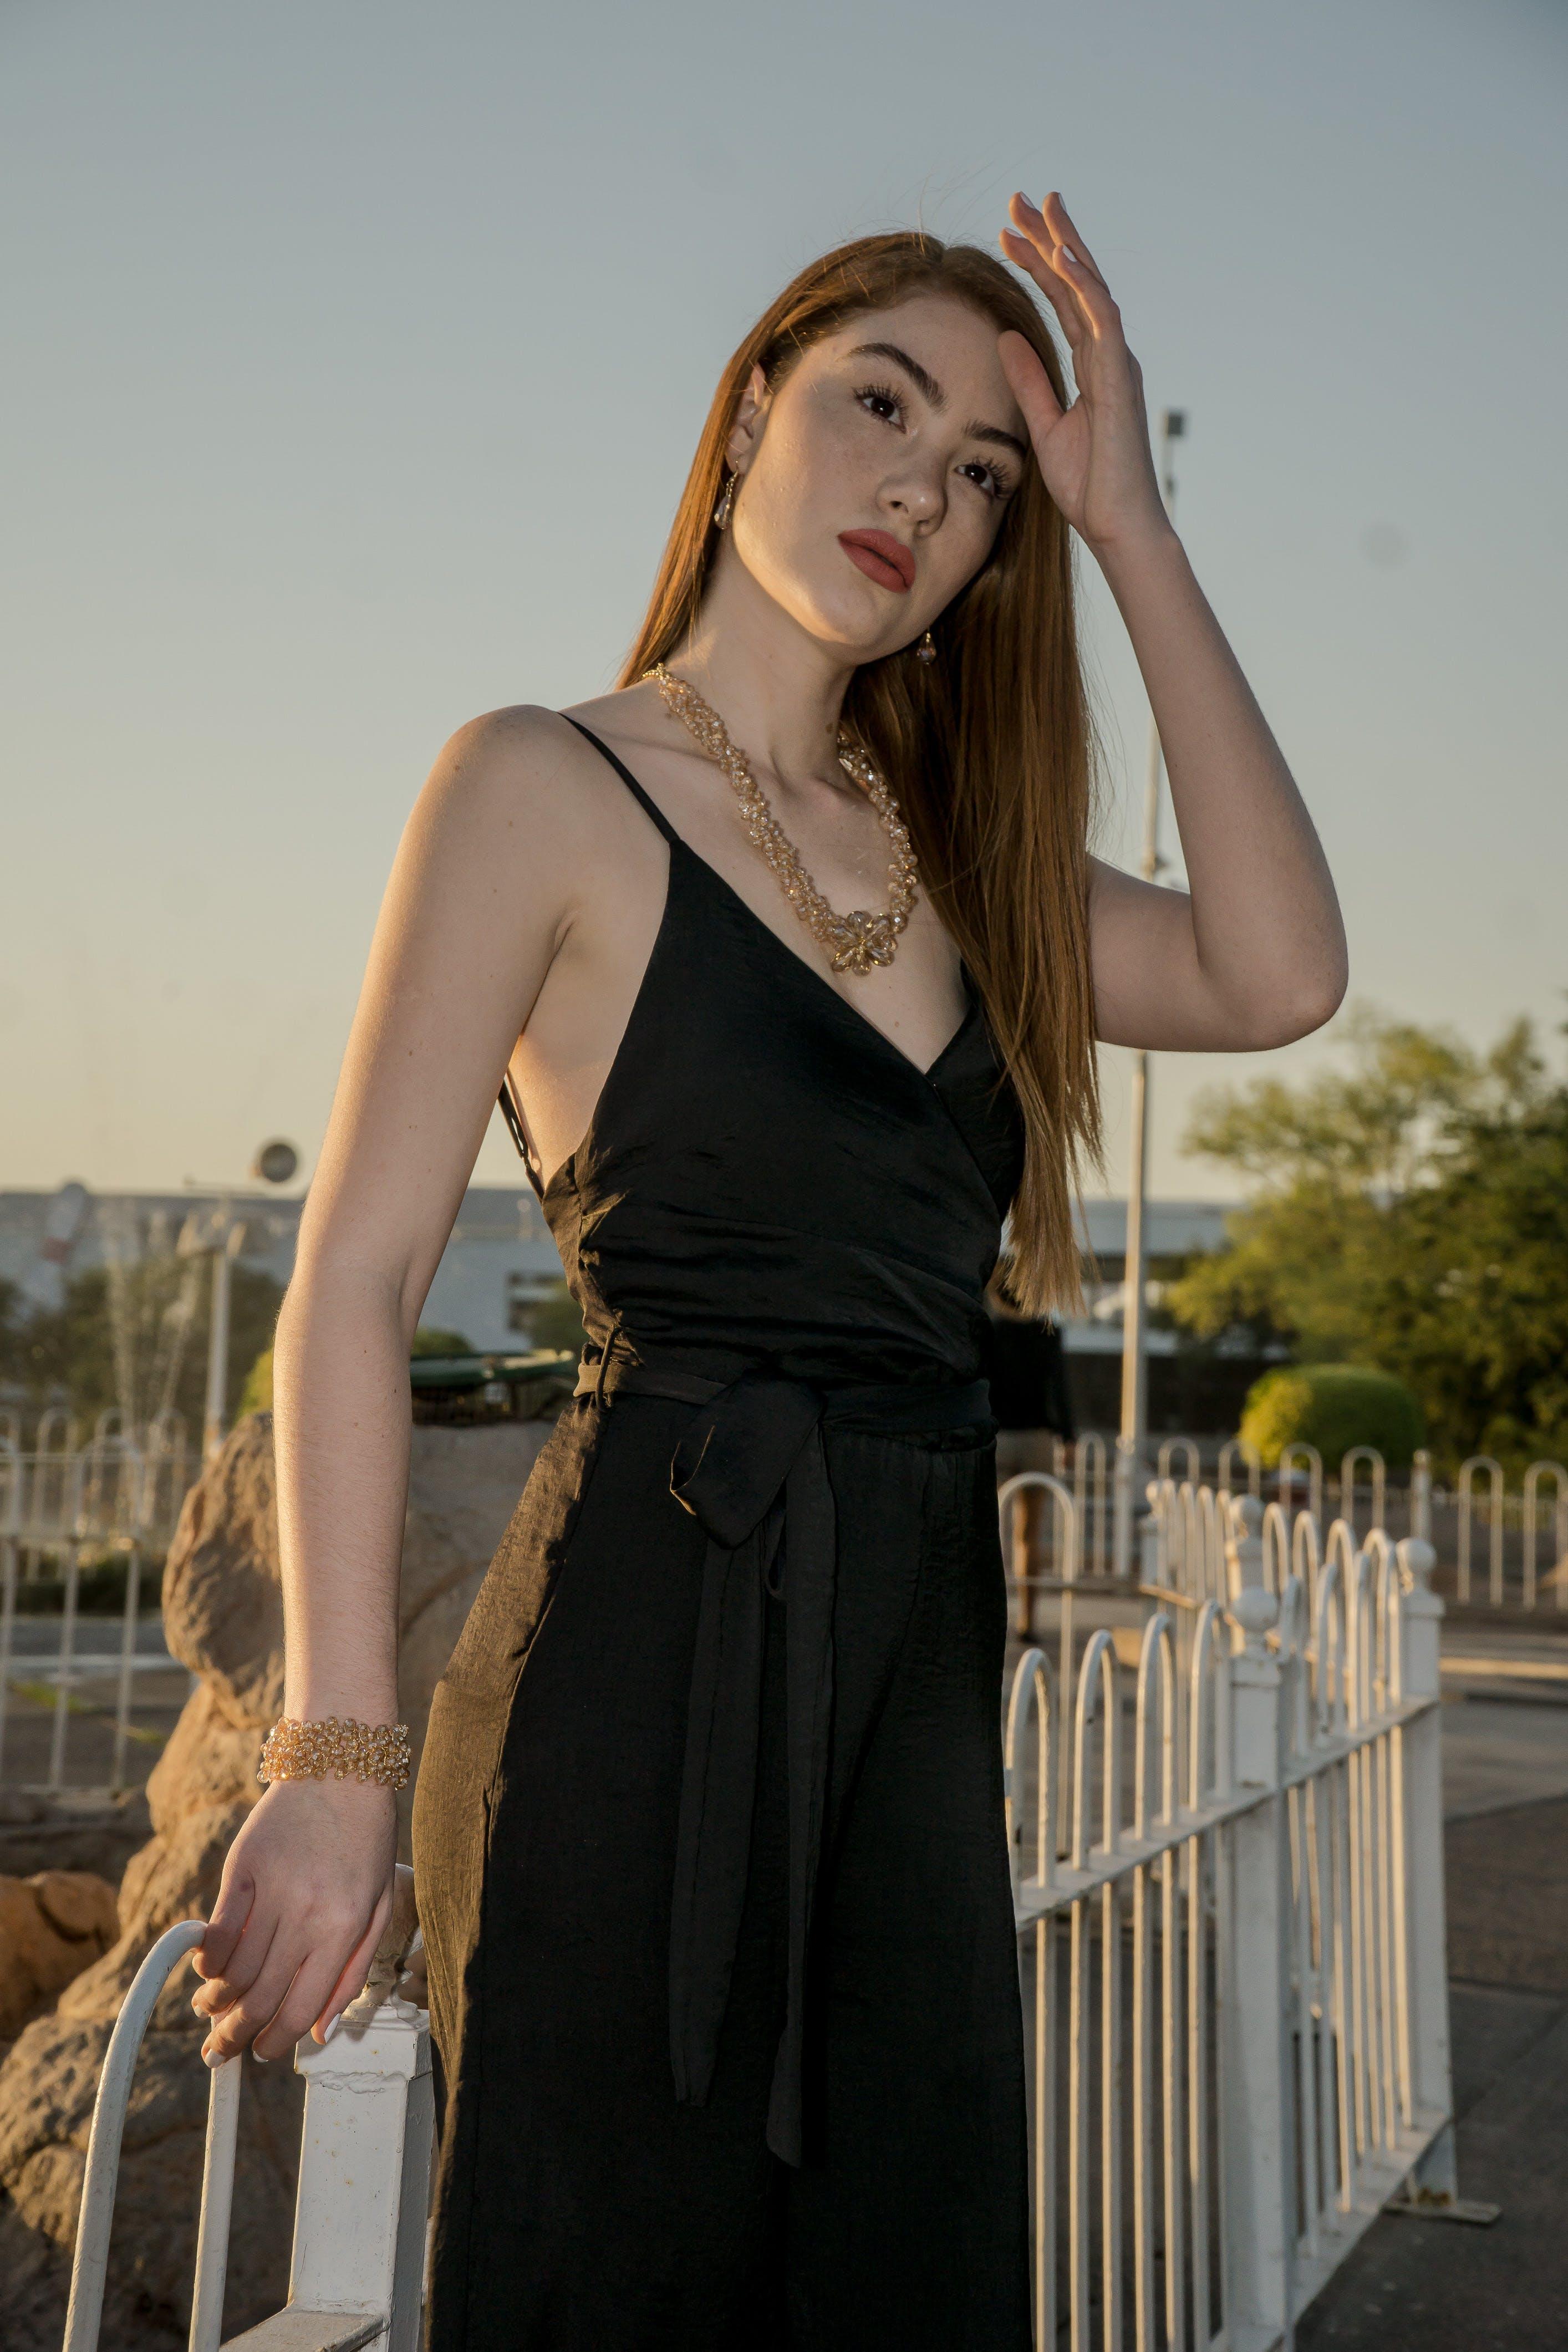 Woman Standing Near White Metal Fence